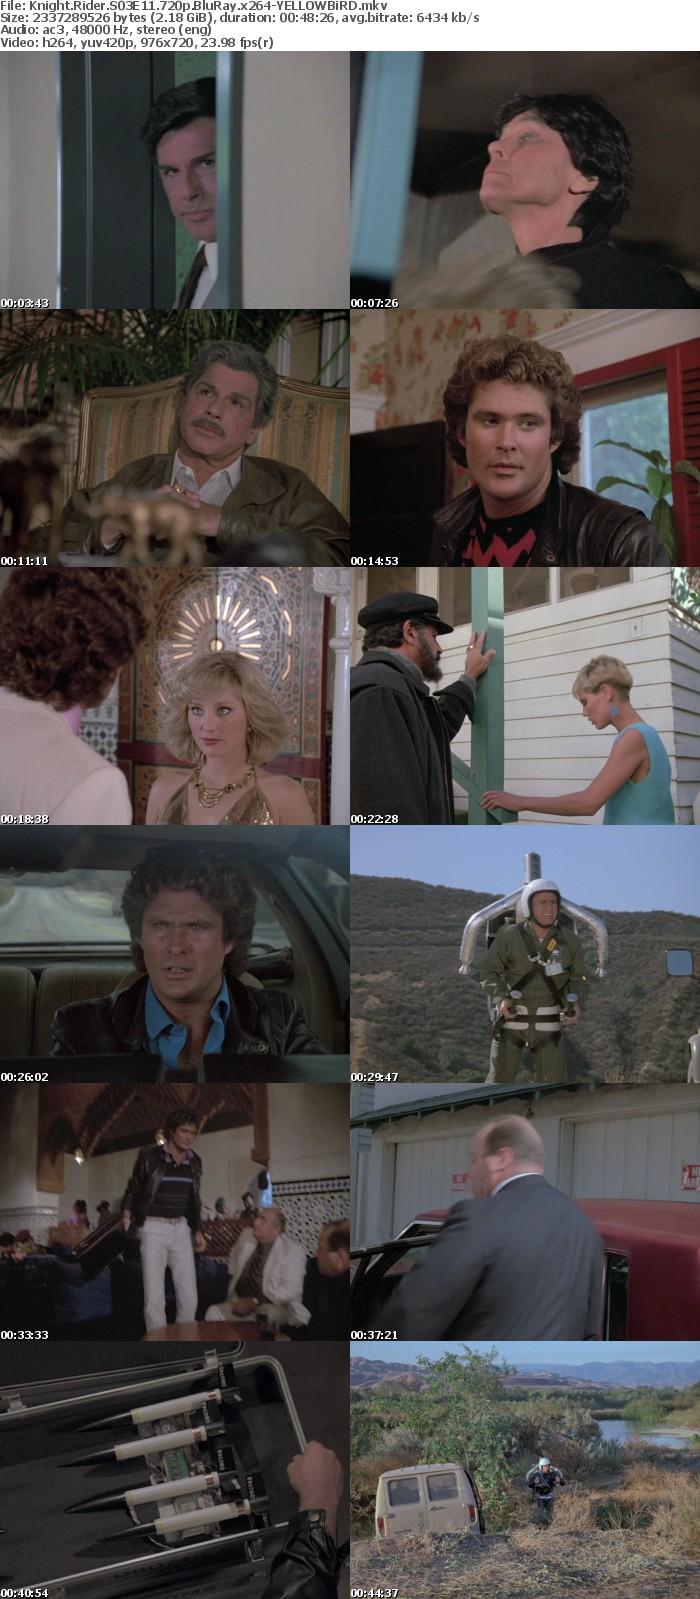 Knight Rider S03 720p BluRay x264